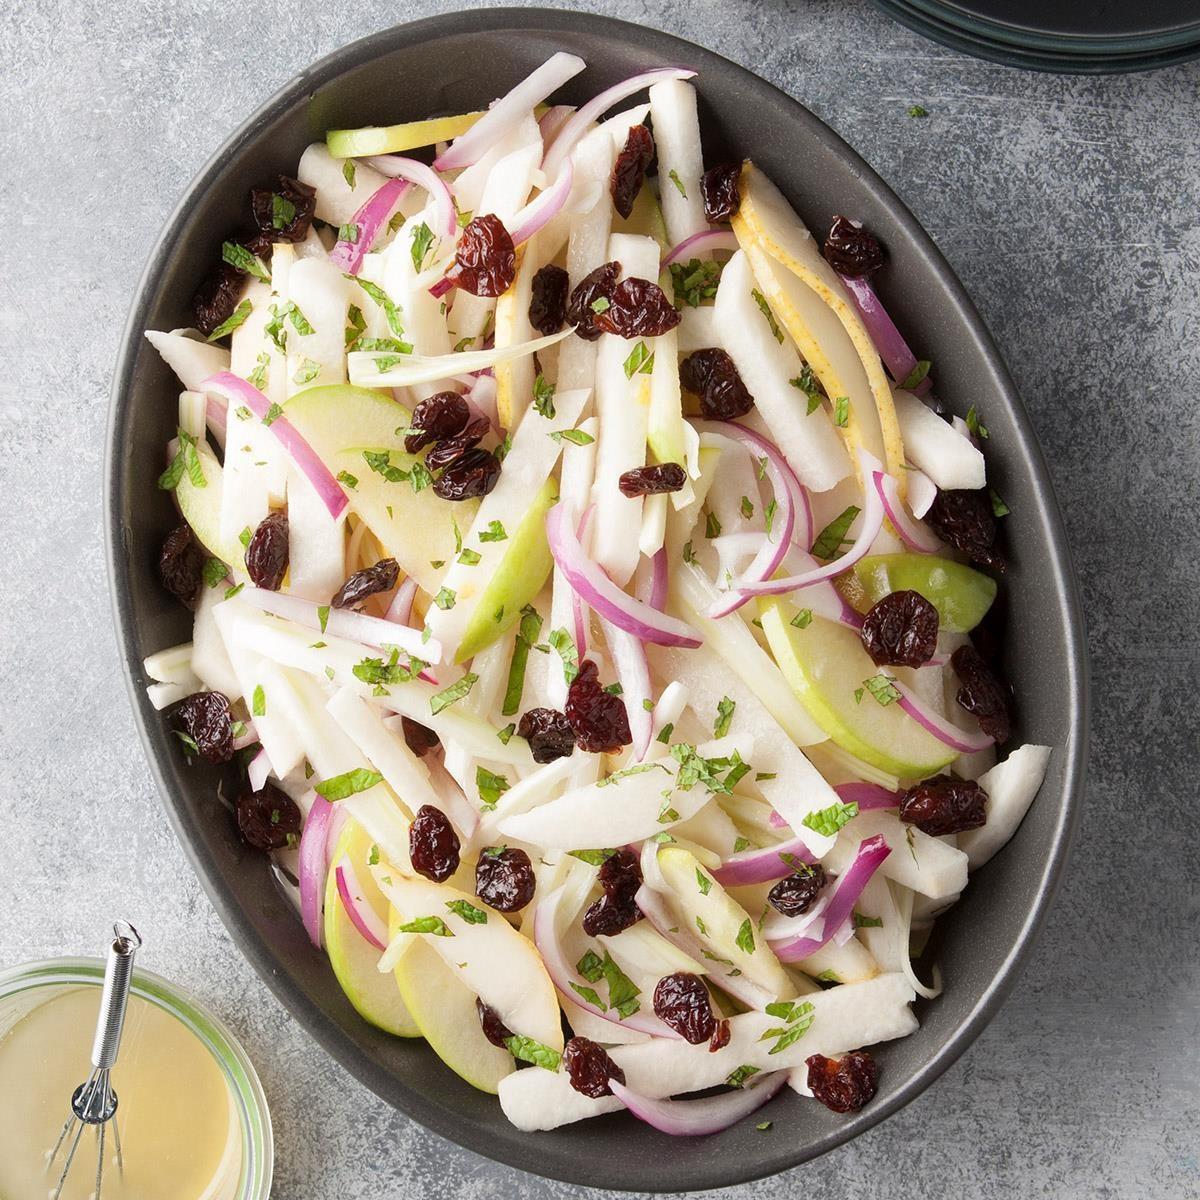 Fennel-Jicama Salad